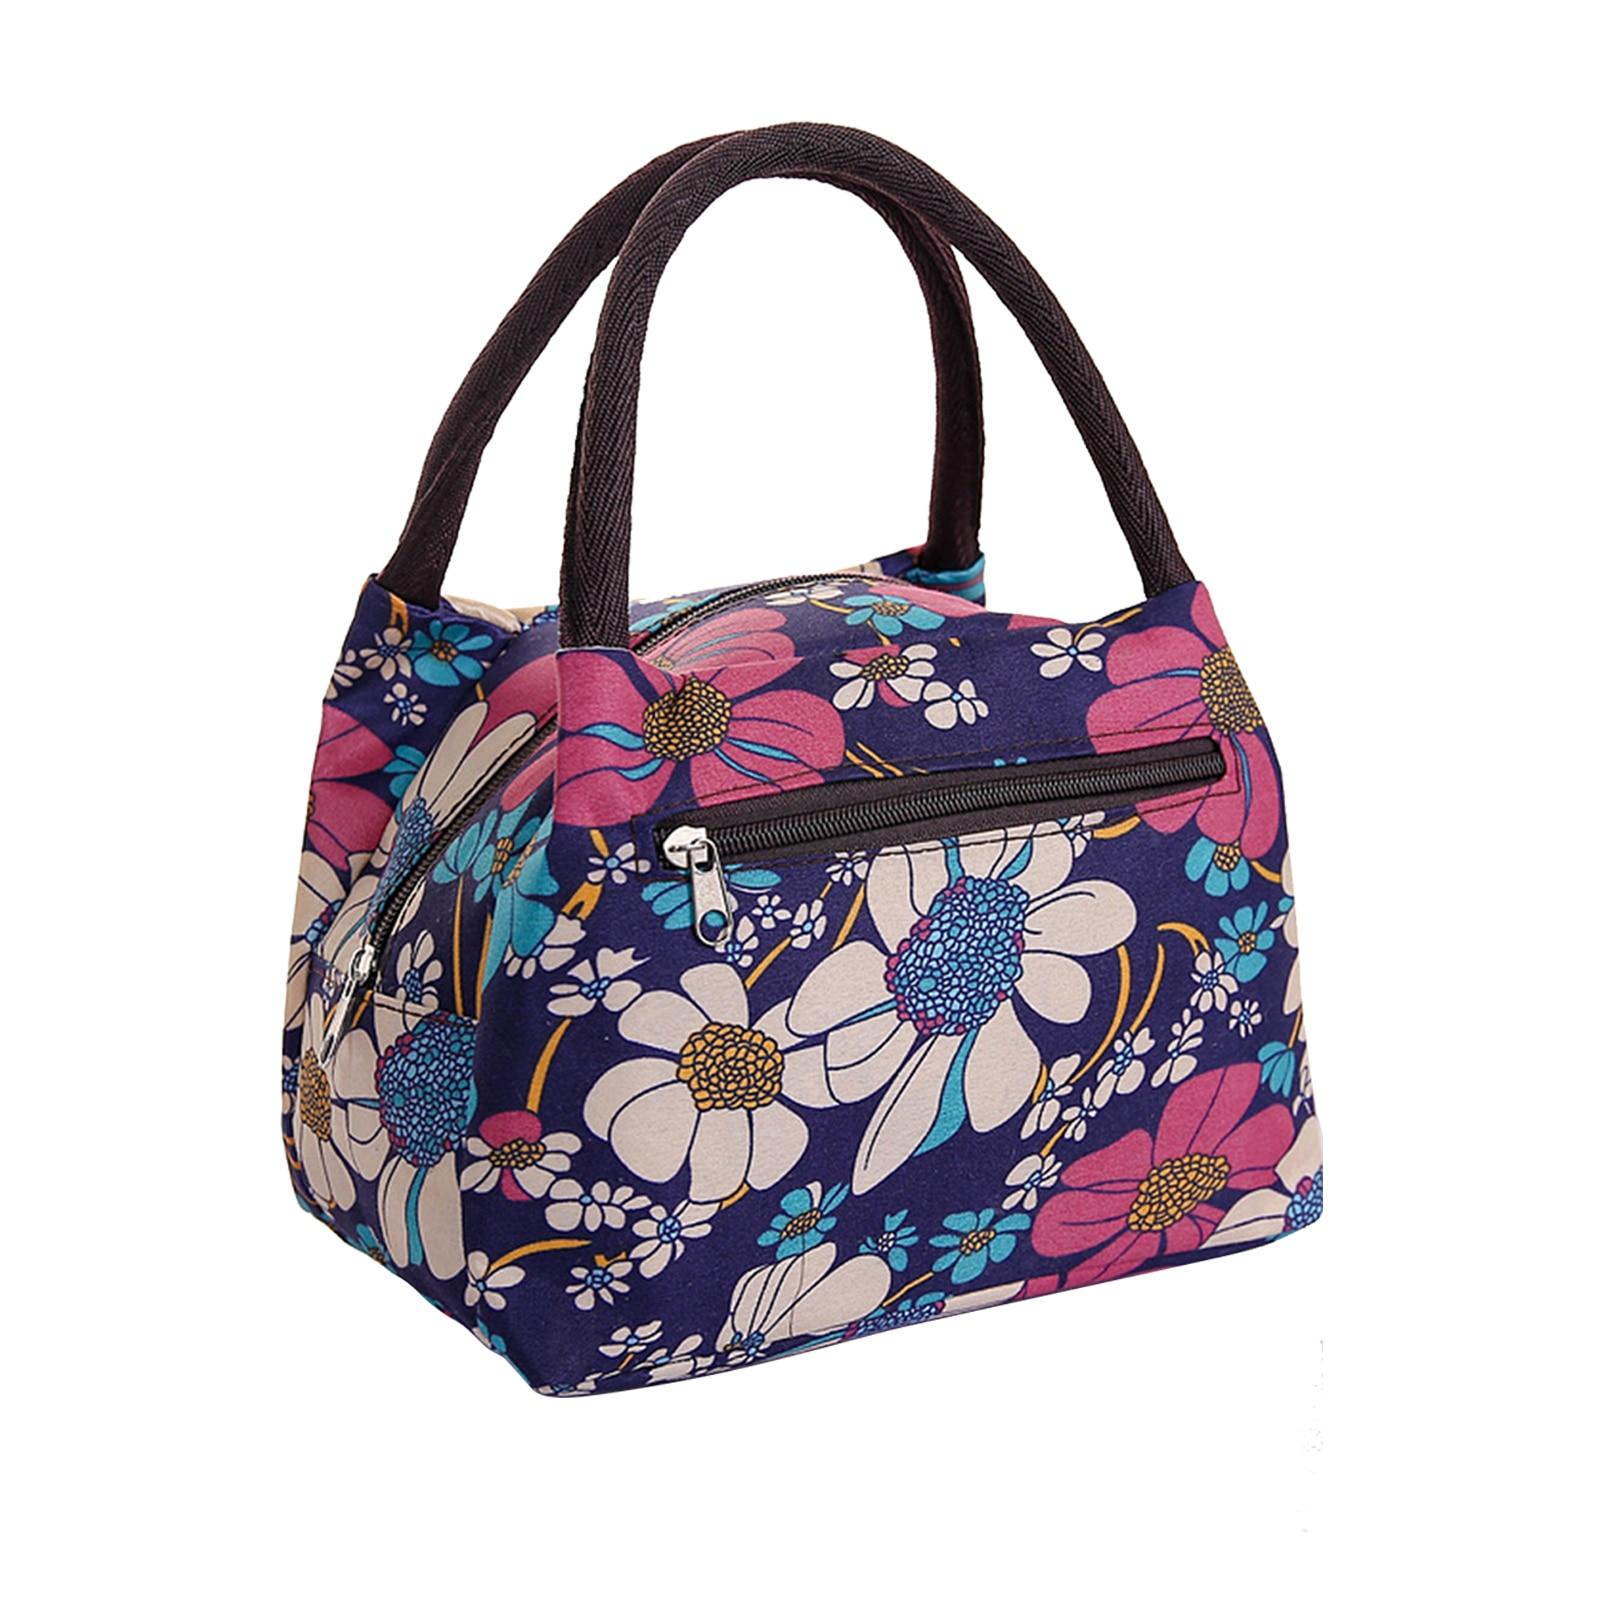 New Fashionable Multifunctional Handbag Large Thermal Insulation Waterproof Adult Lunch Bag